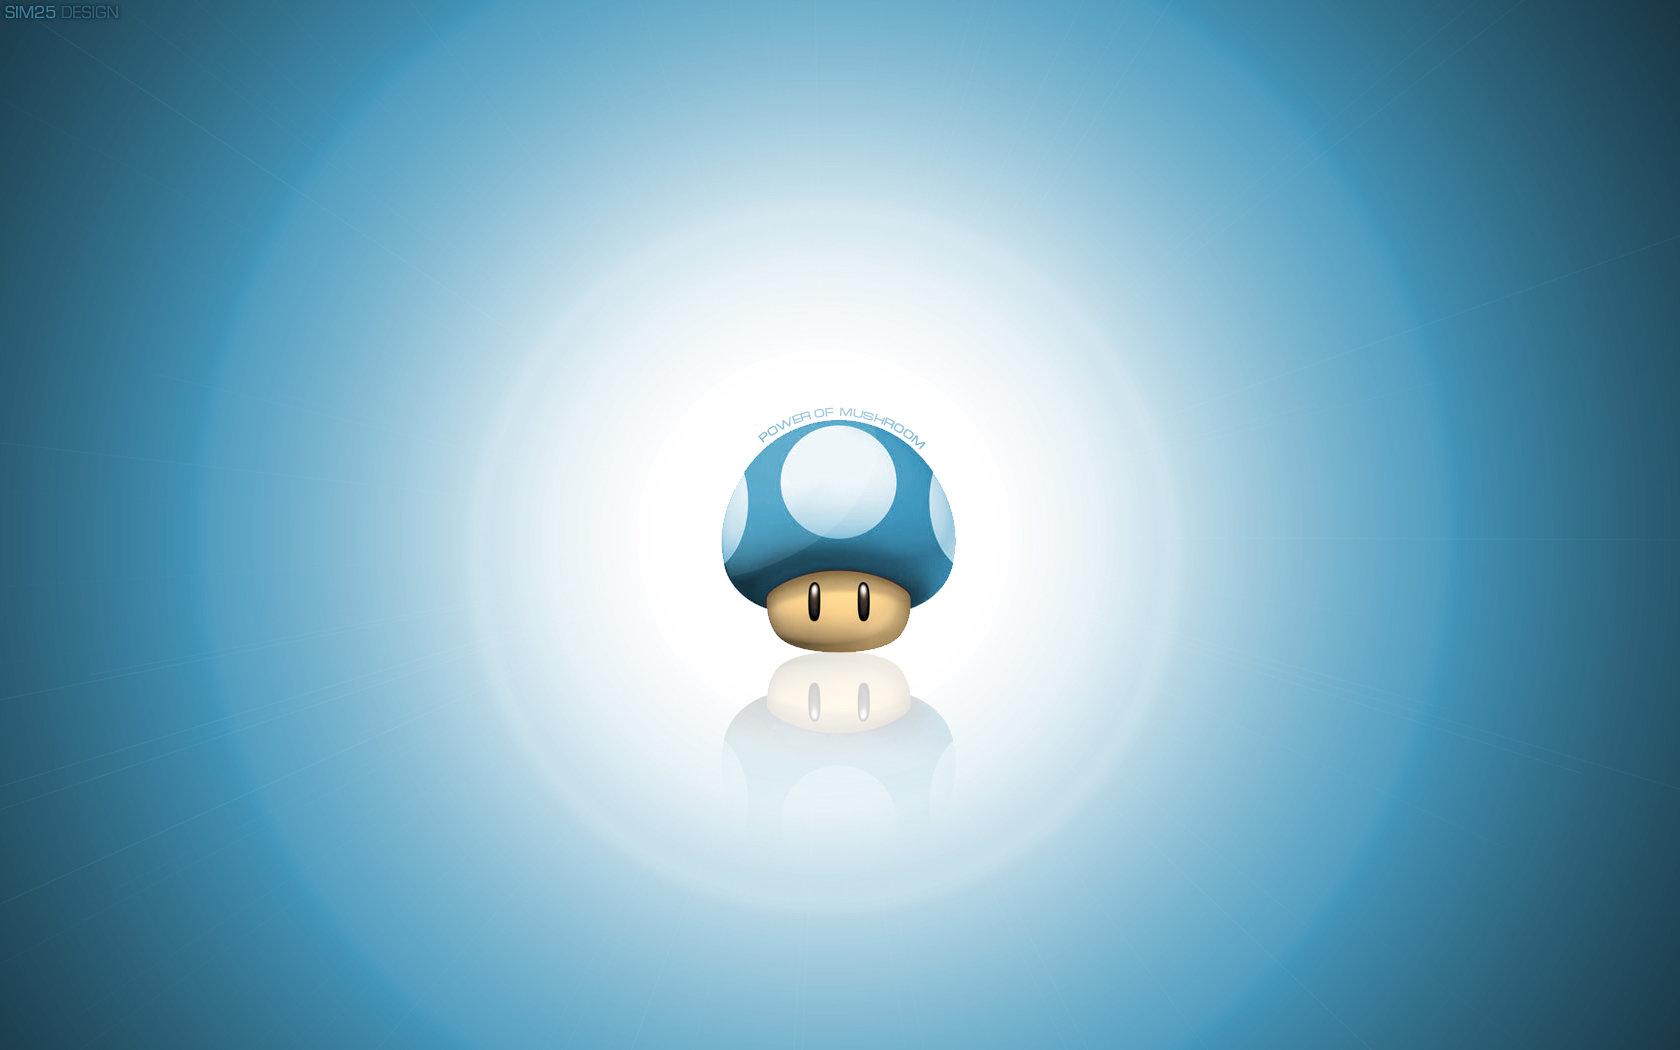 Mushroom Wallpaper HD by Sim25 Design 1680x1050